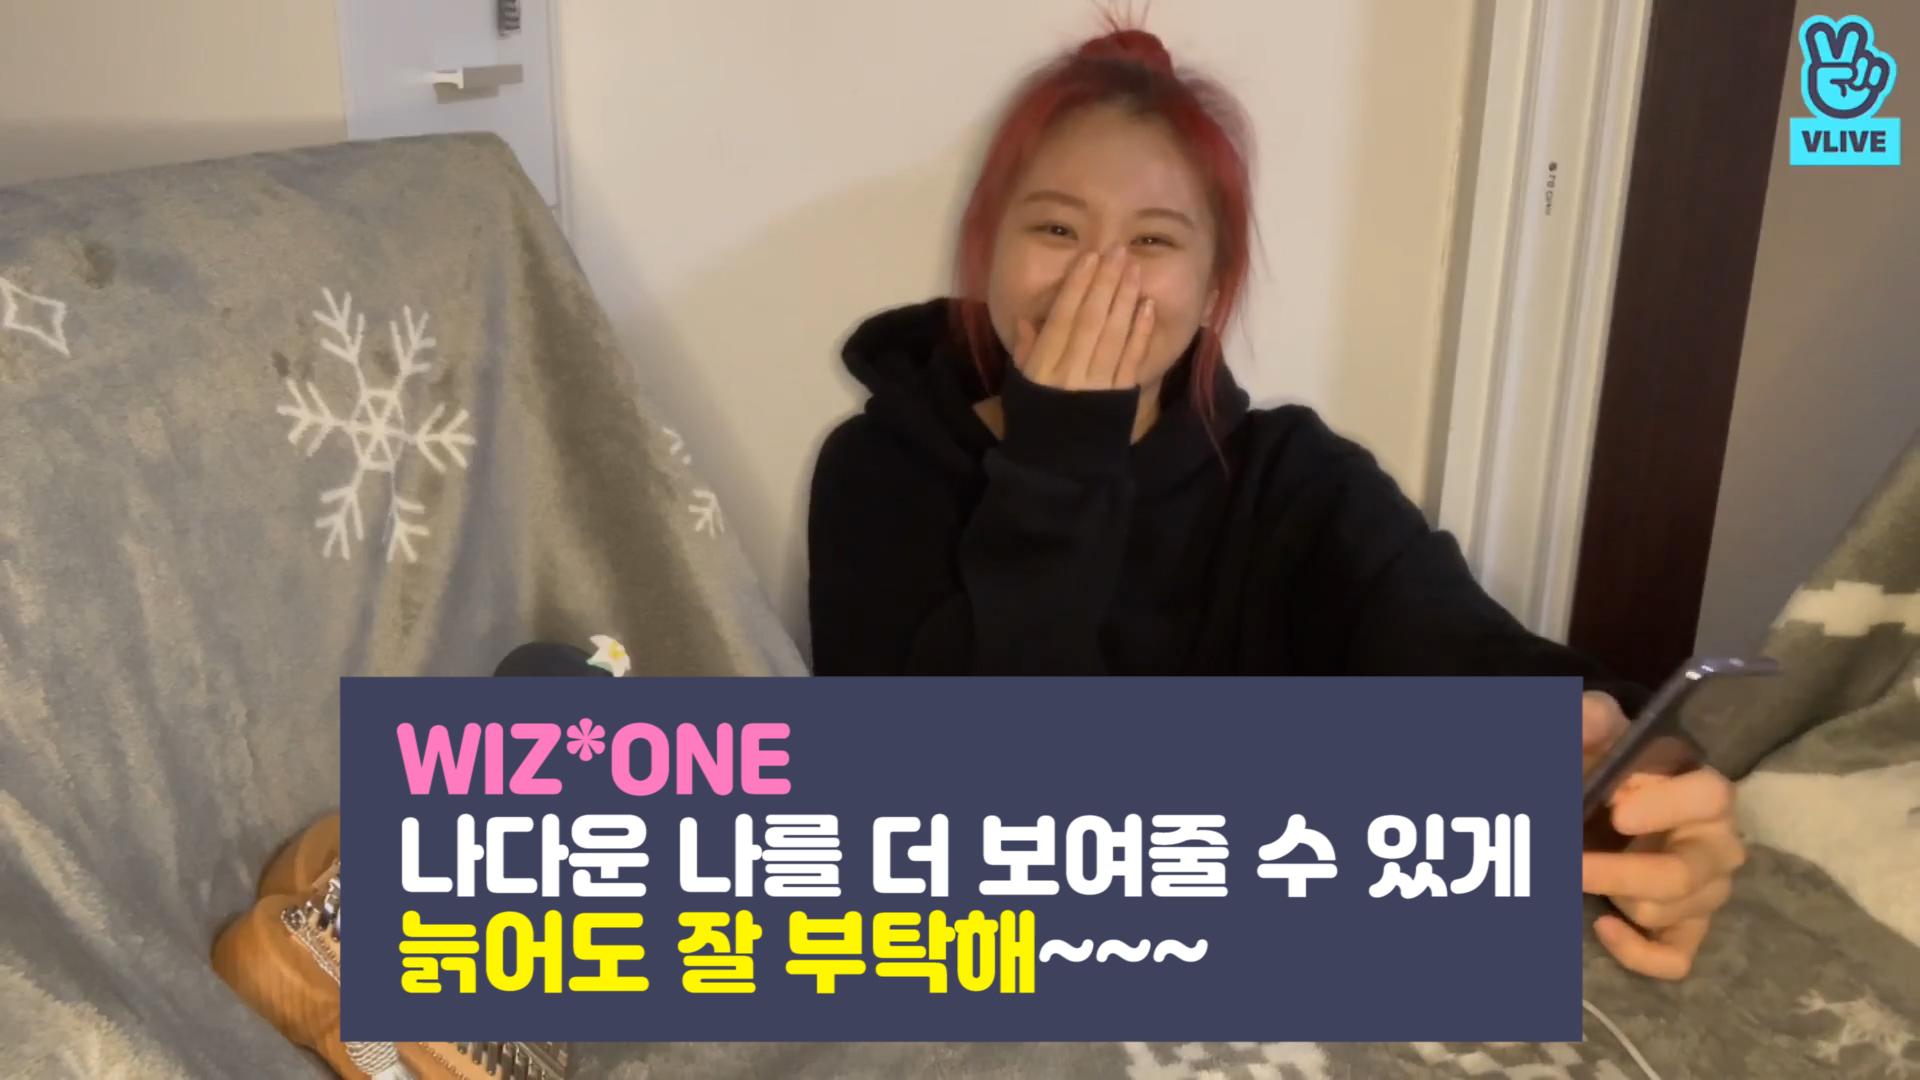 [IZ*ONE] 처음부터 마지막까지 아이즈원이니까 늙잘부❣️ (ChaeYeon imagining about her future)